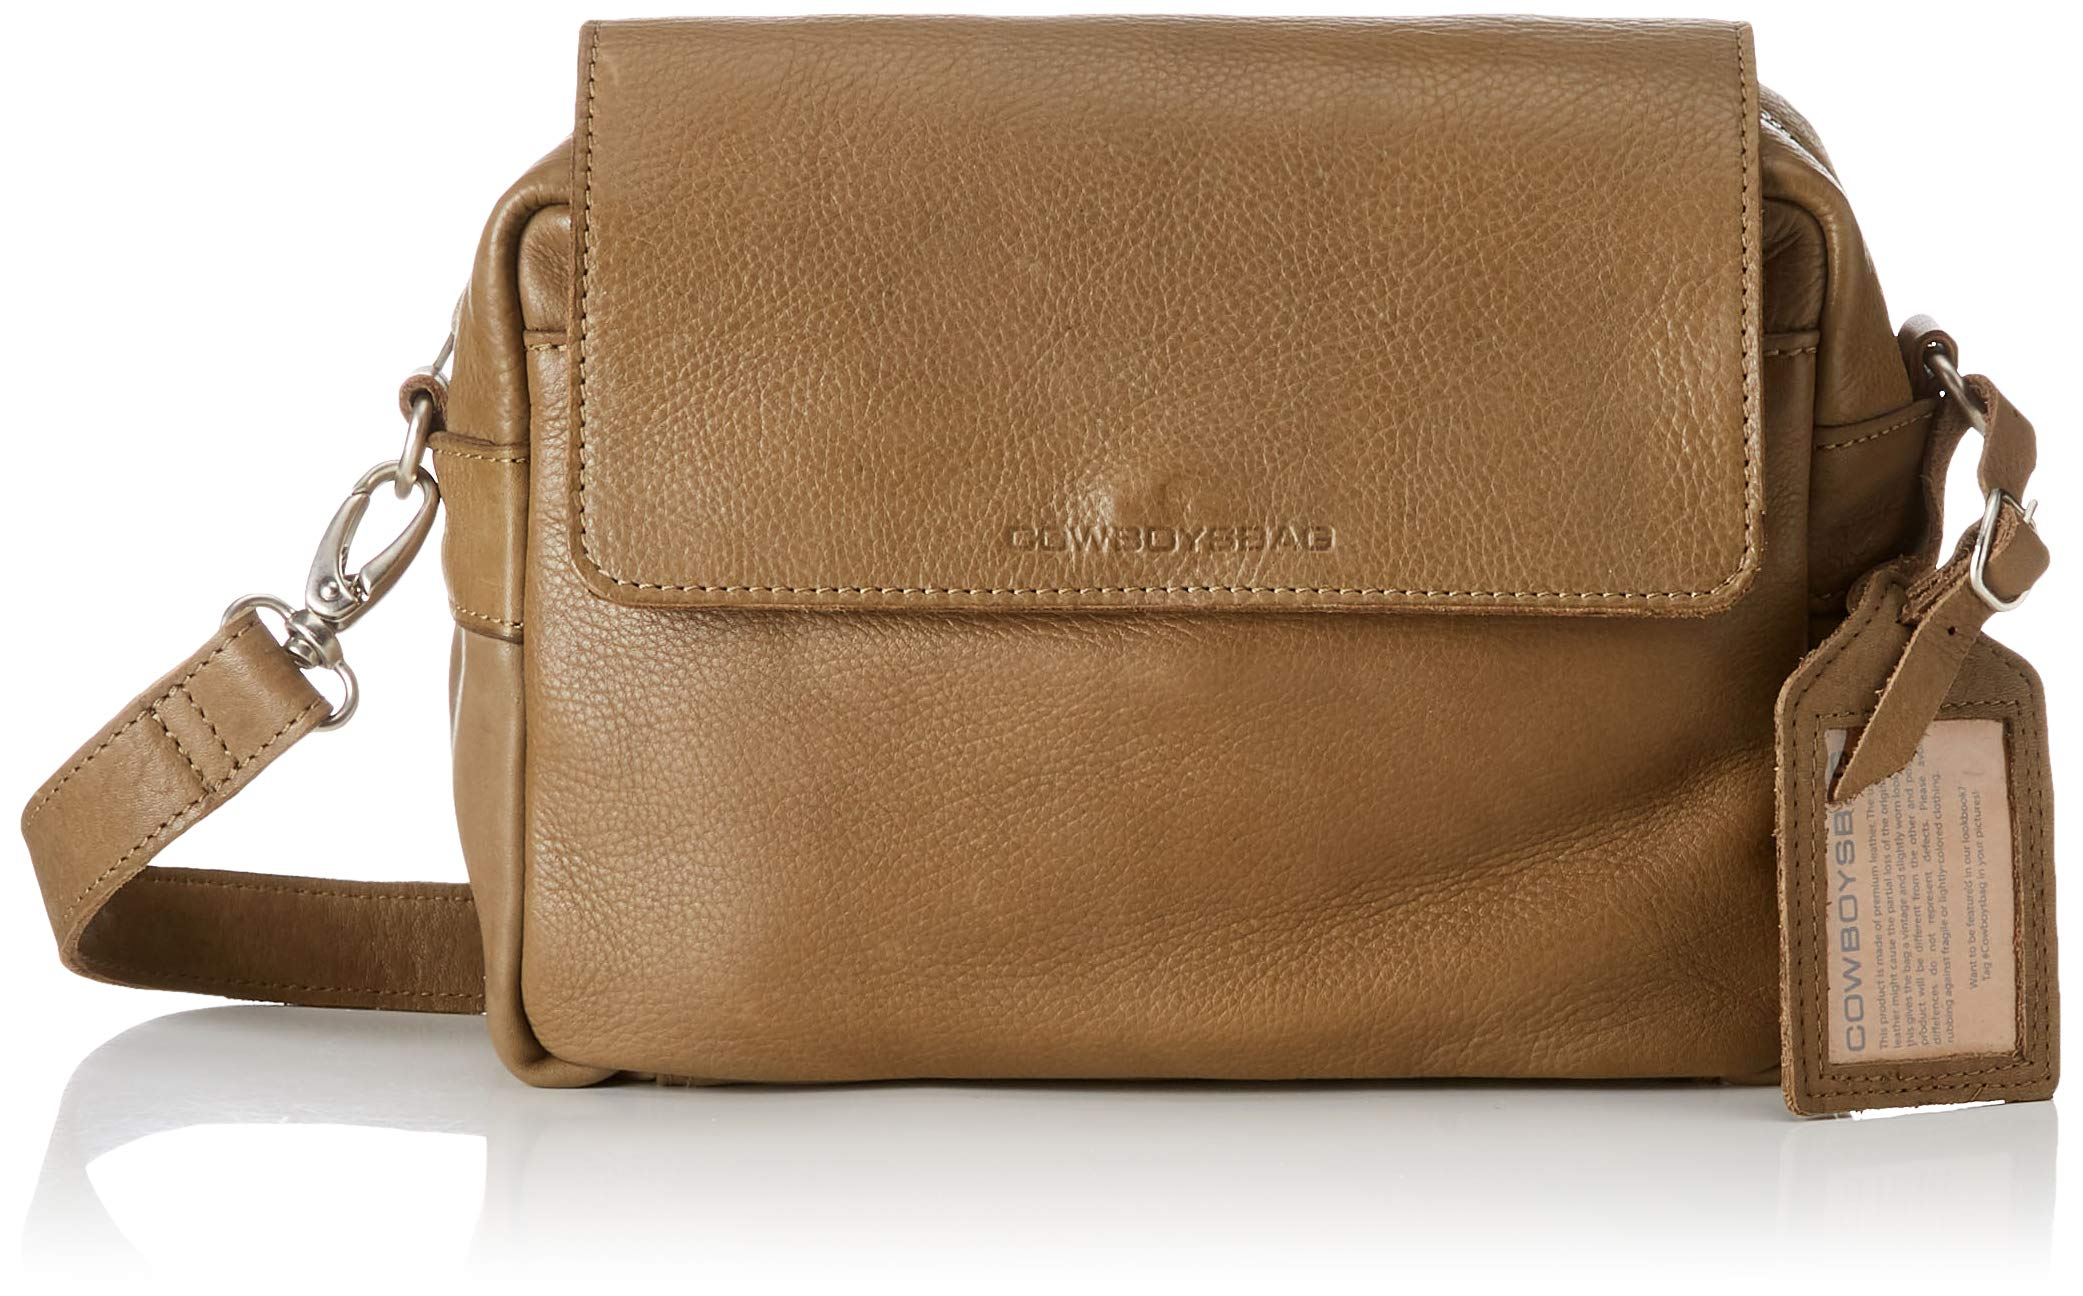 HooperSacs 5 T X Bag Bandoulière FemmeMarron000560Mud8 Cmb Cowboysbag H 5x17x24 8NwPv0yOmn